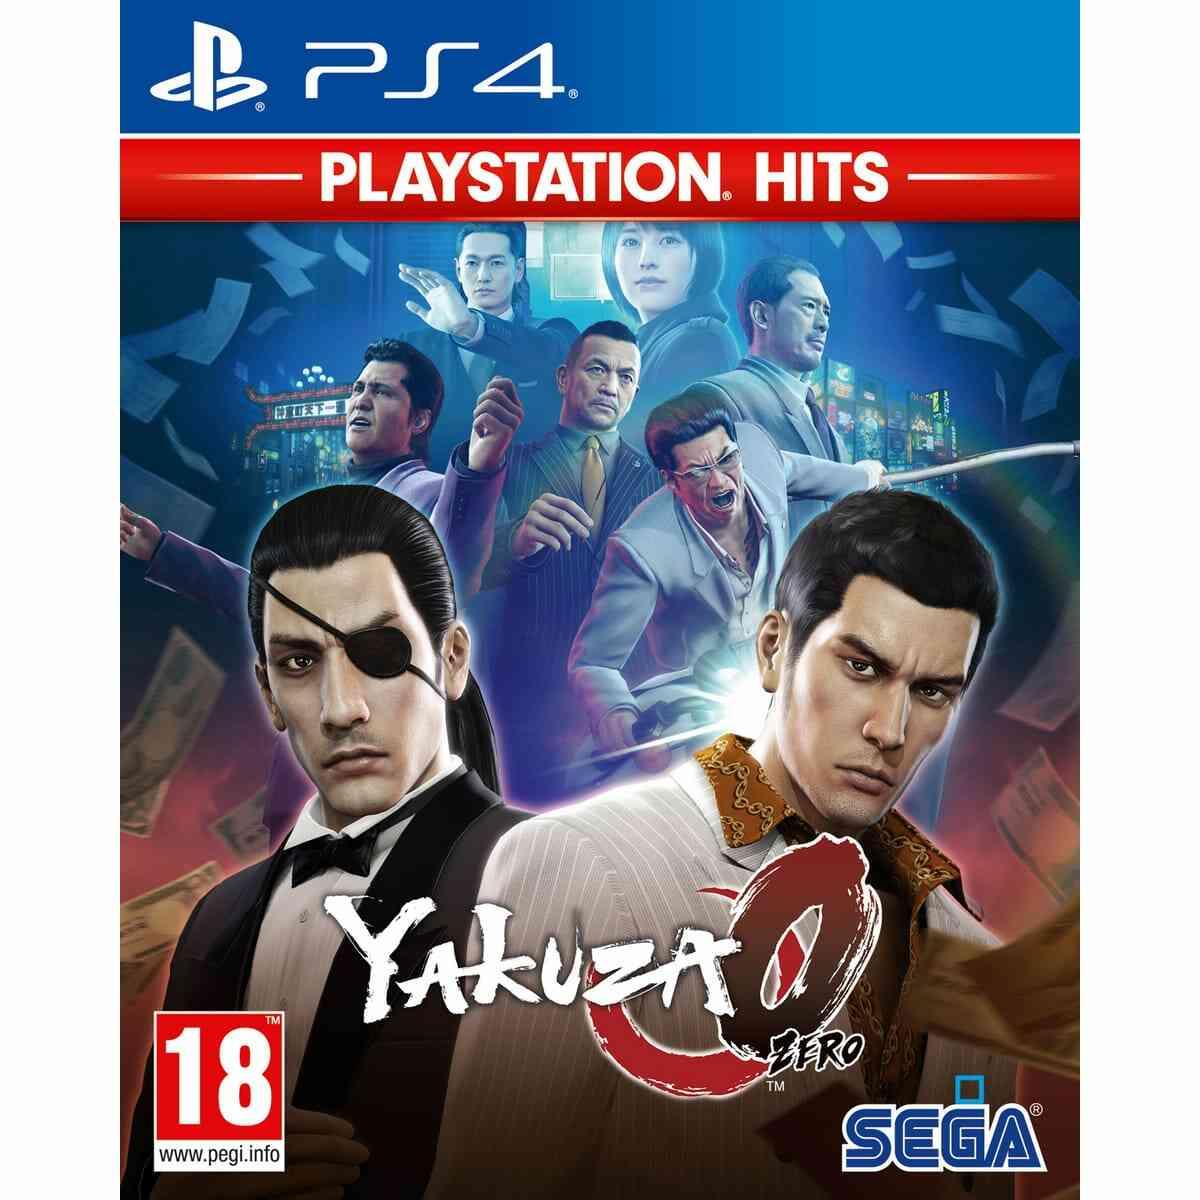 Yakuza Zero - Playstation hits - PS4 1